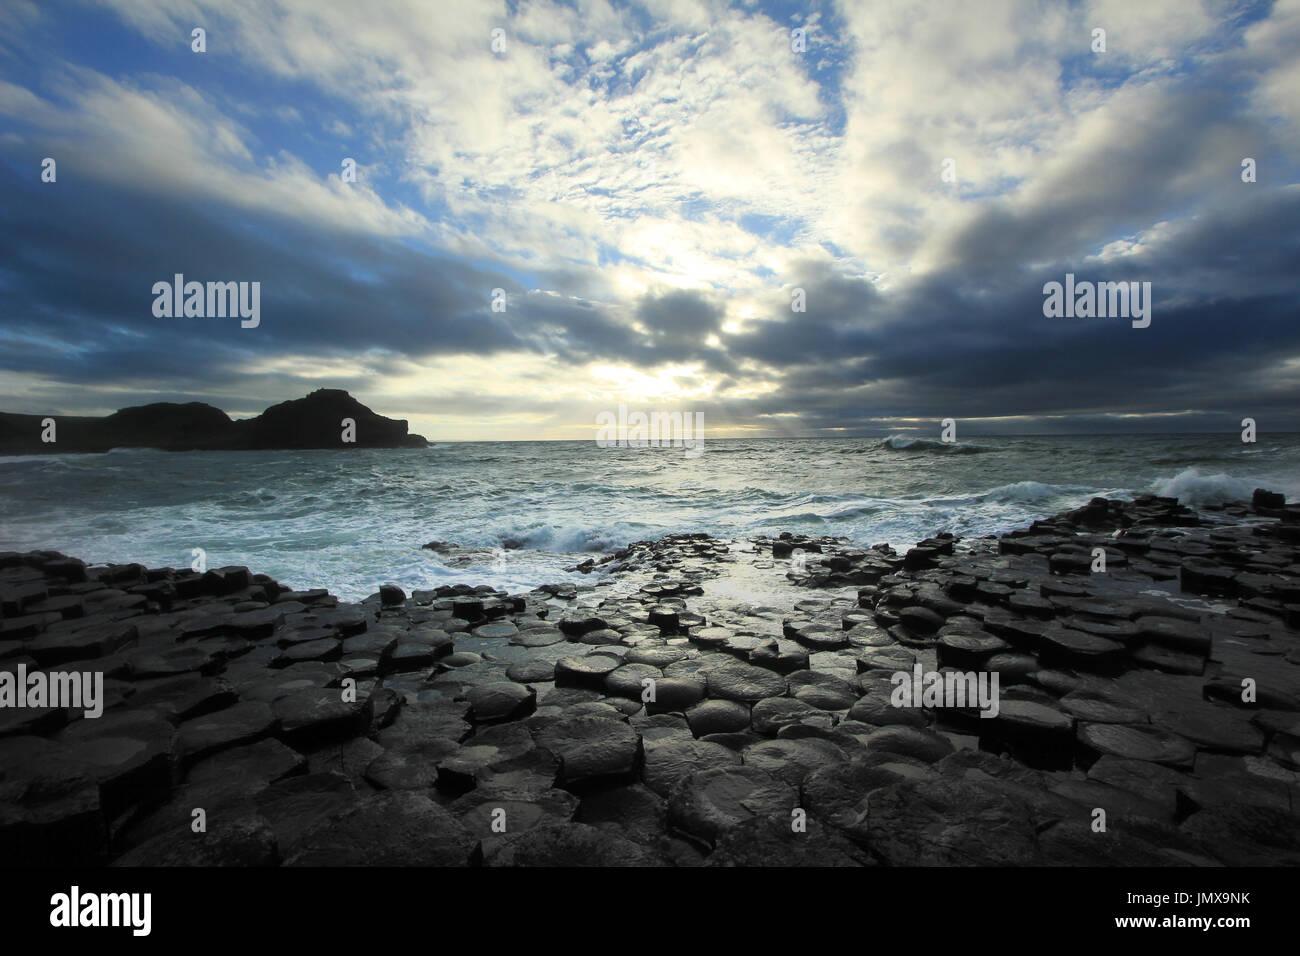 Northern Ireland, famous tourist site - Stock Image